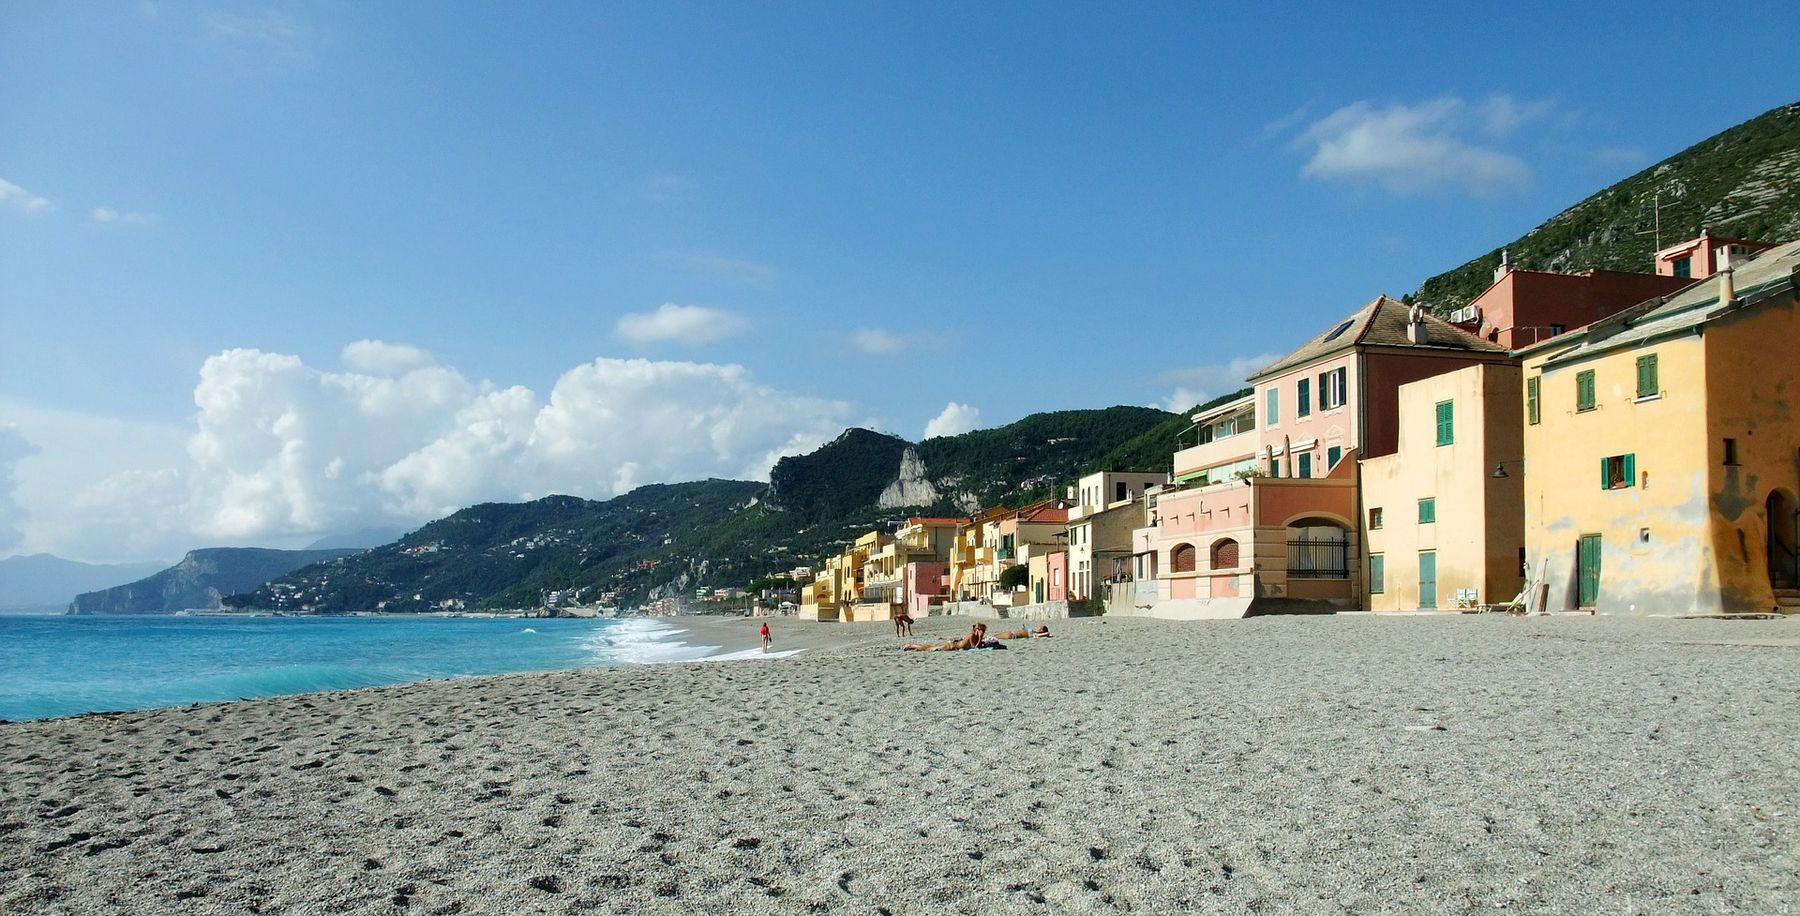 Spiaggia di Varigotti - Liguria